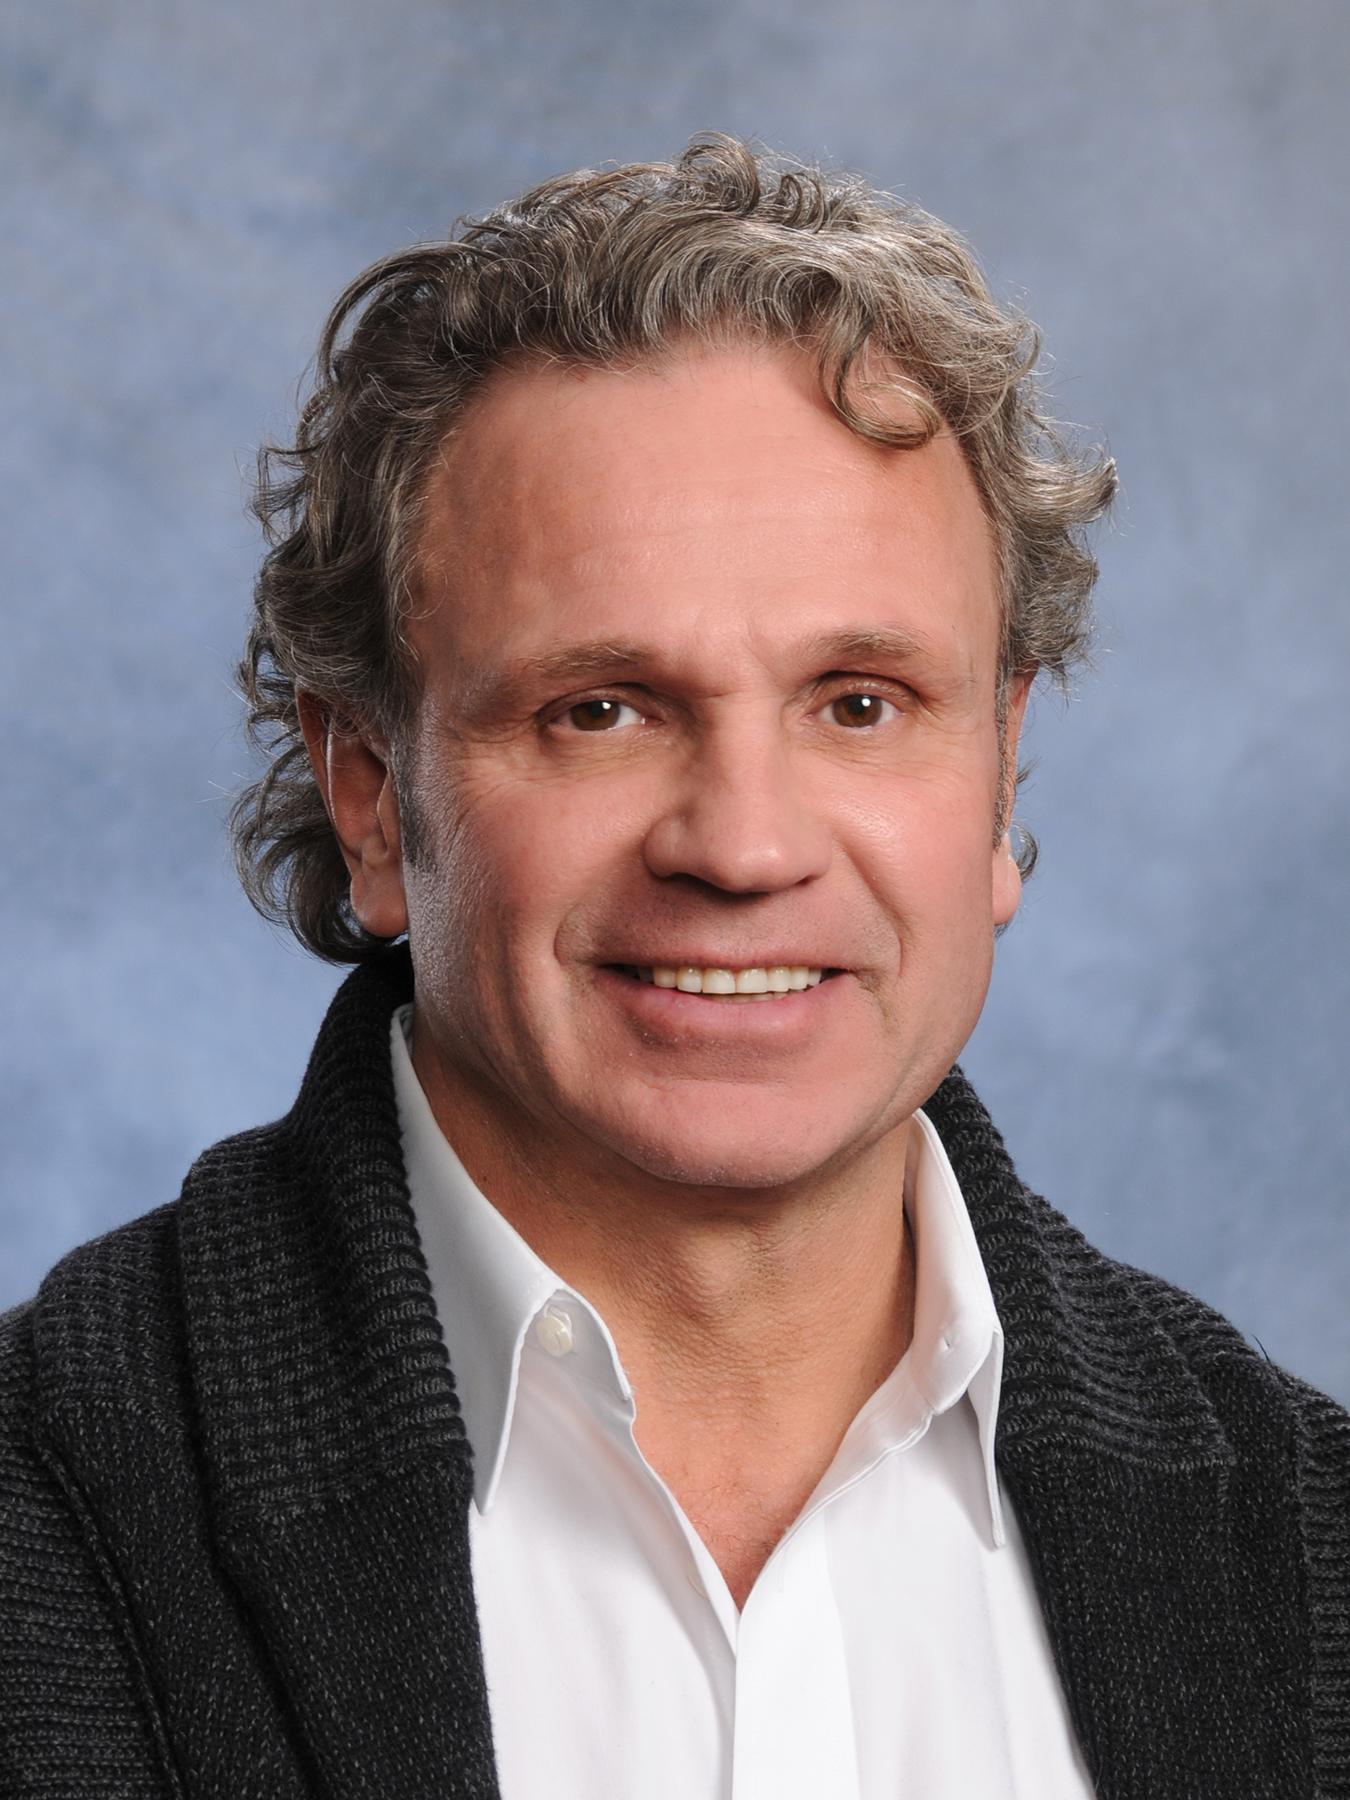 Christopher Oravitz, MD